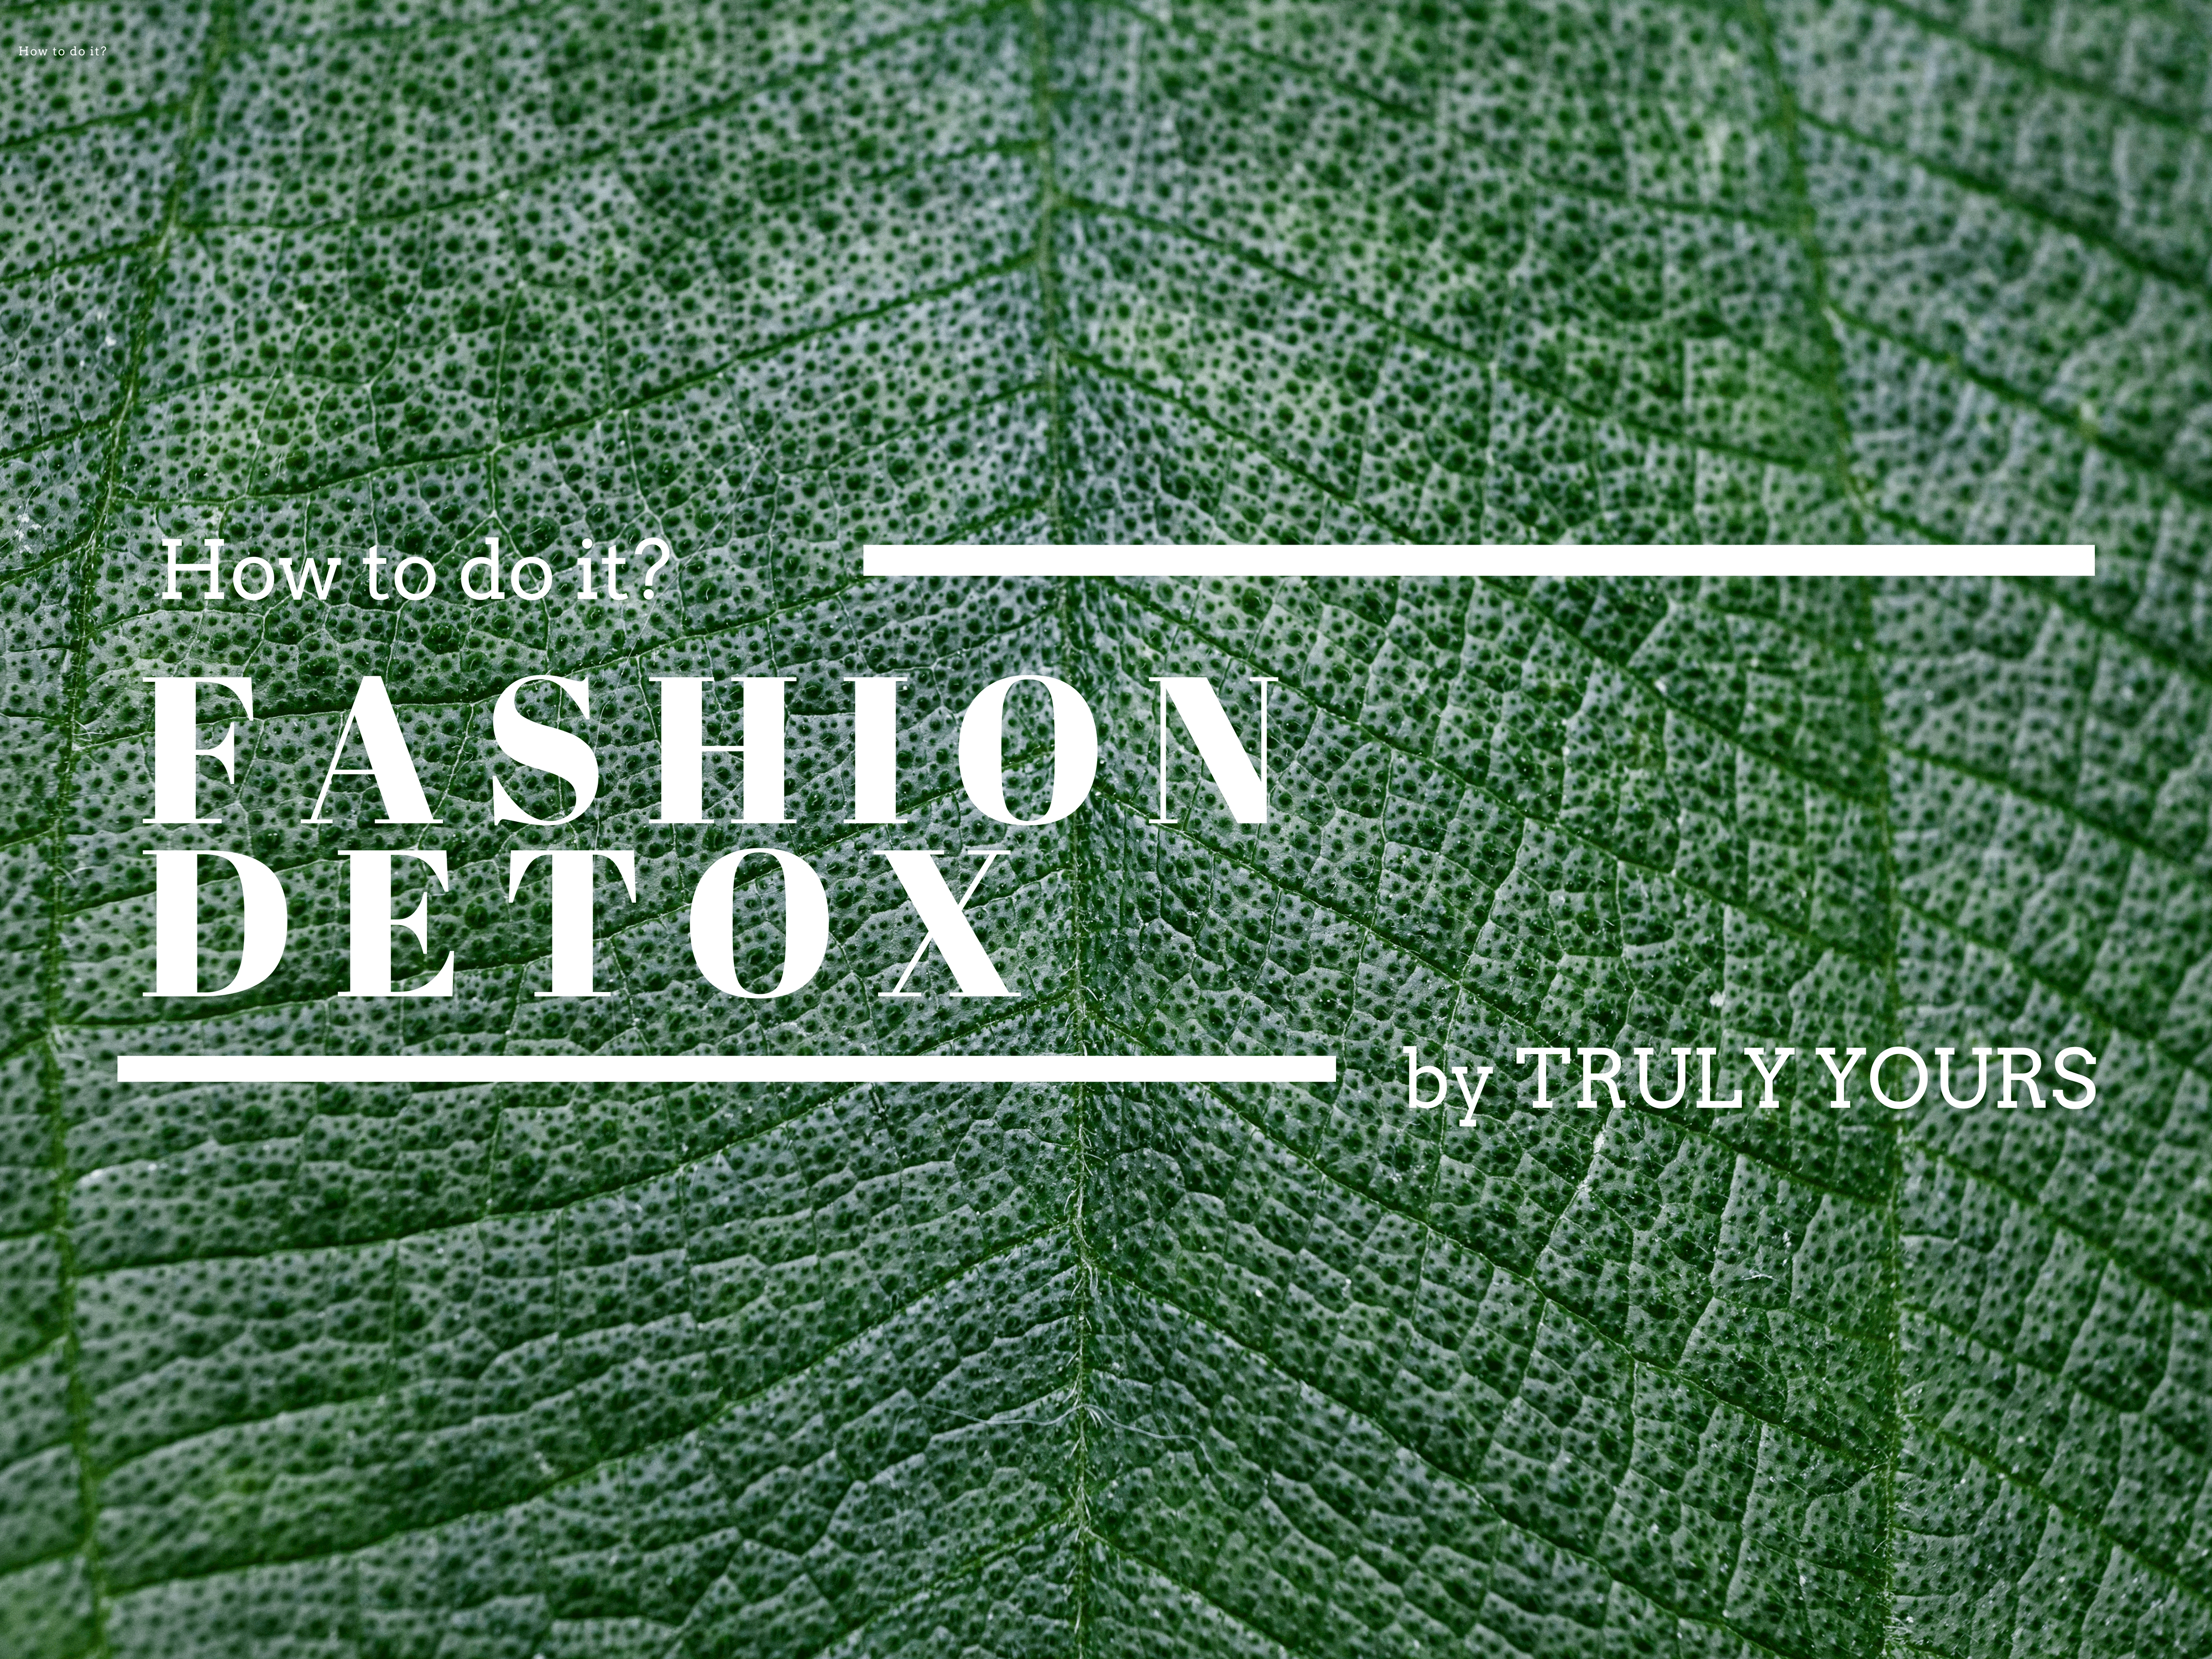 Fashiondetox_fashion mode Bekleidung nachhaltig